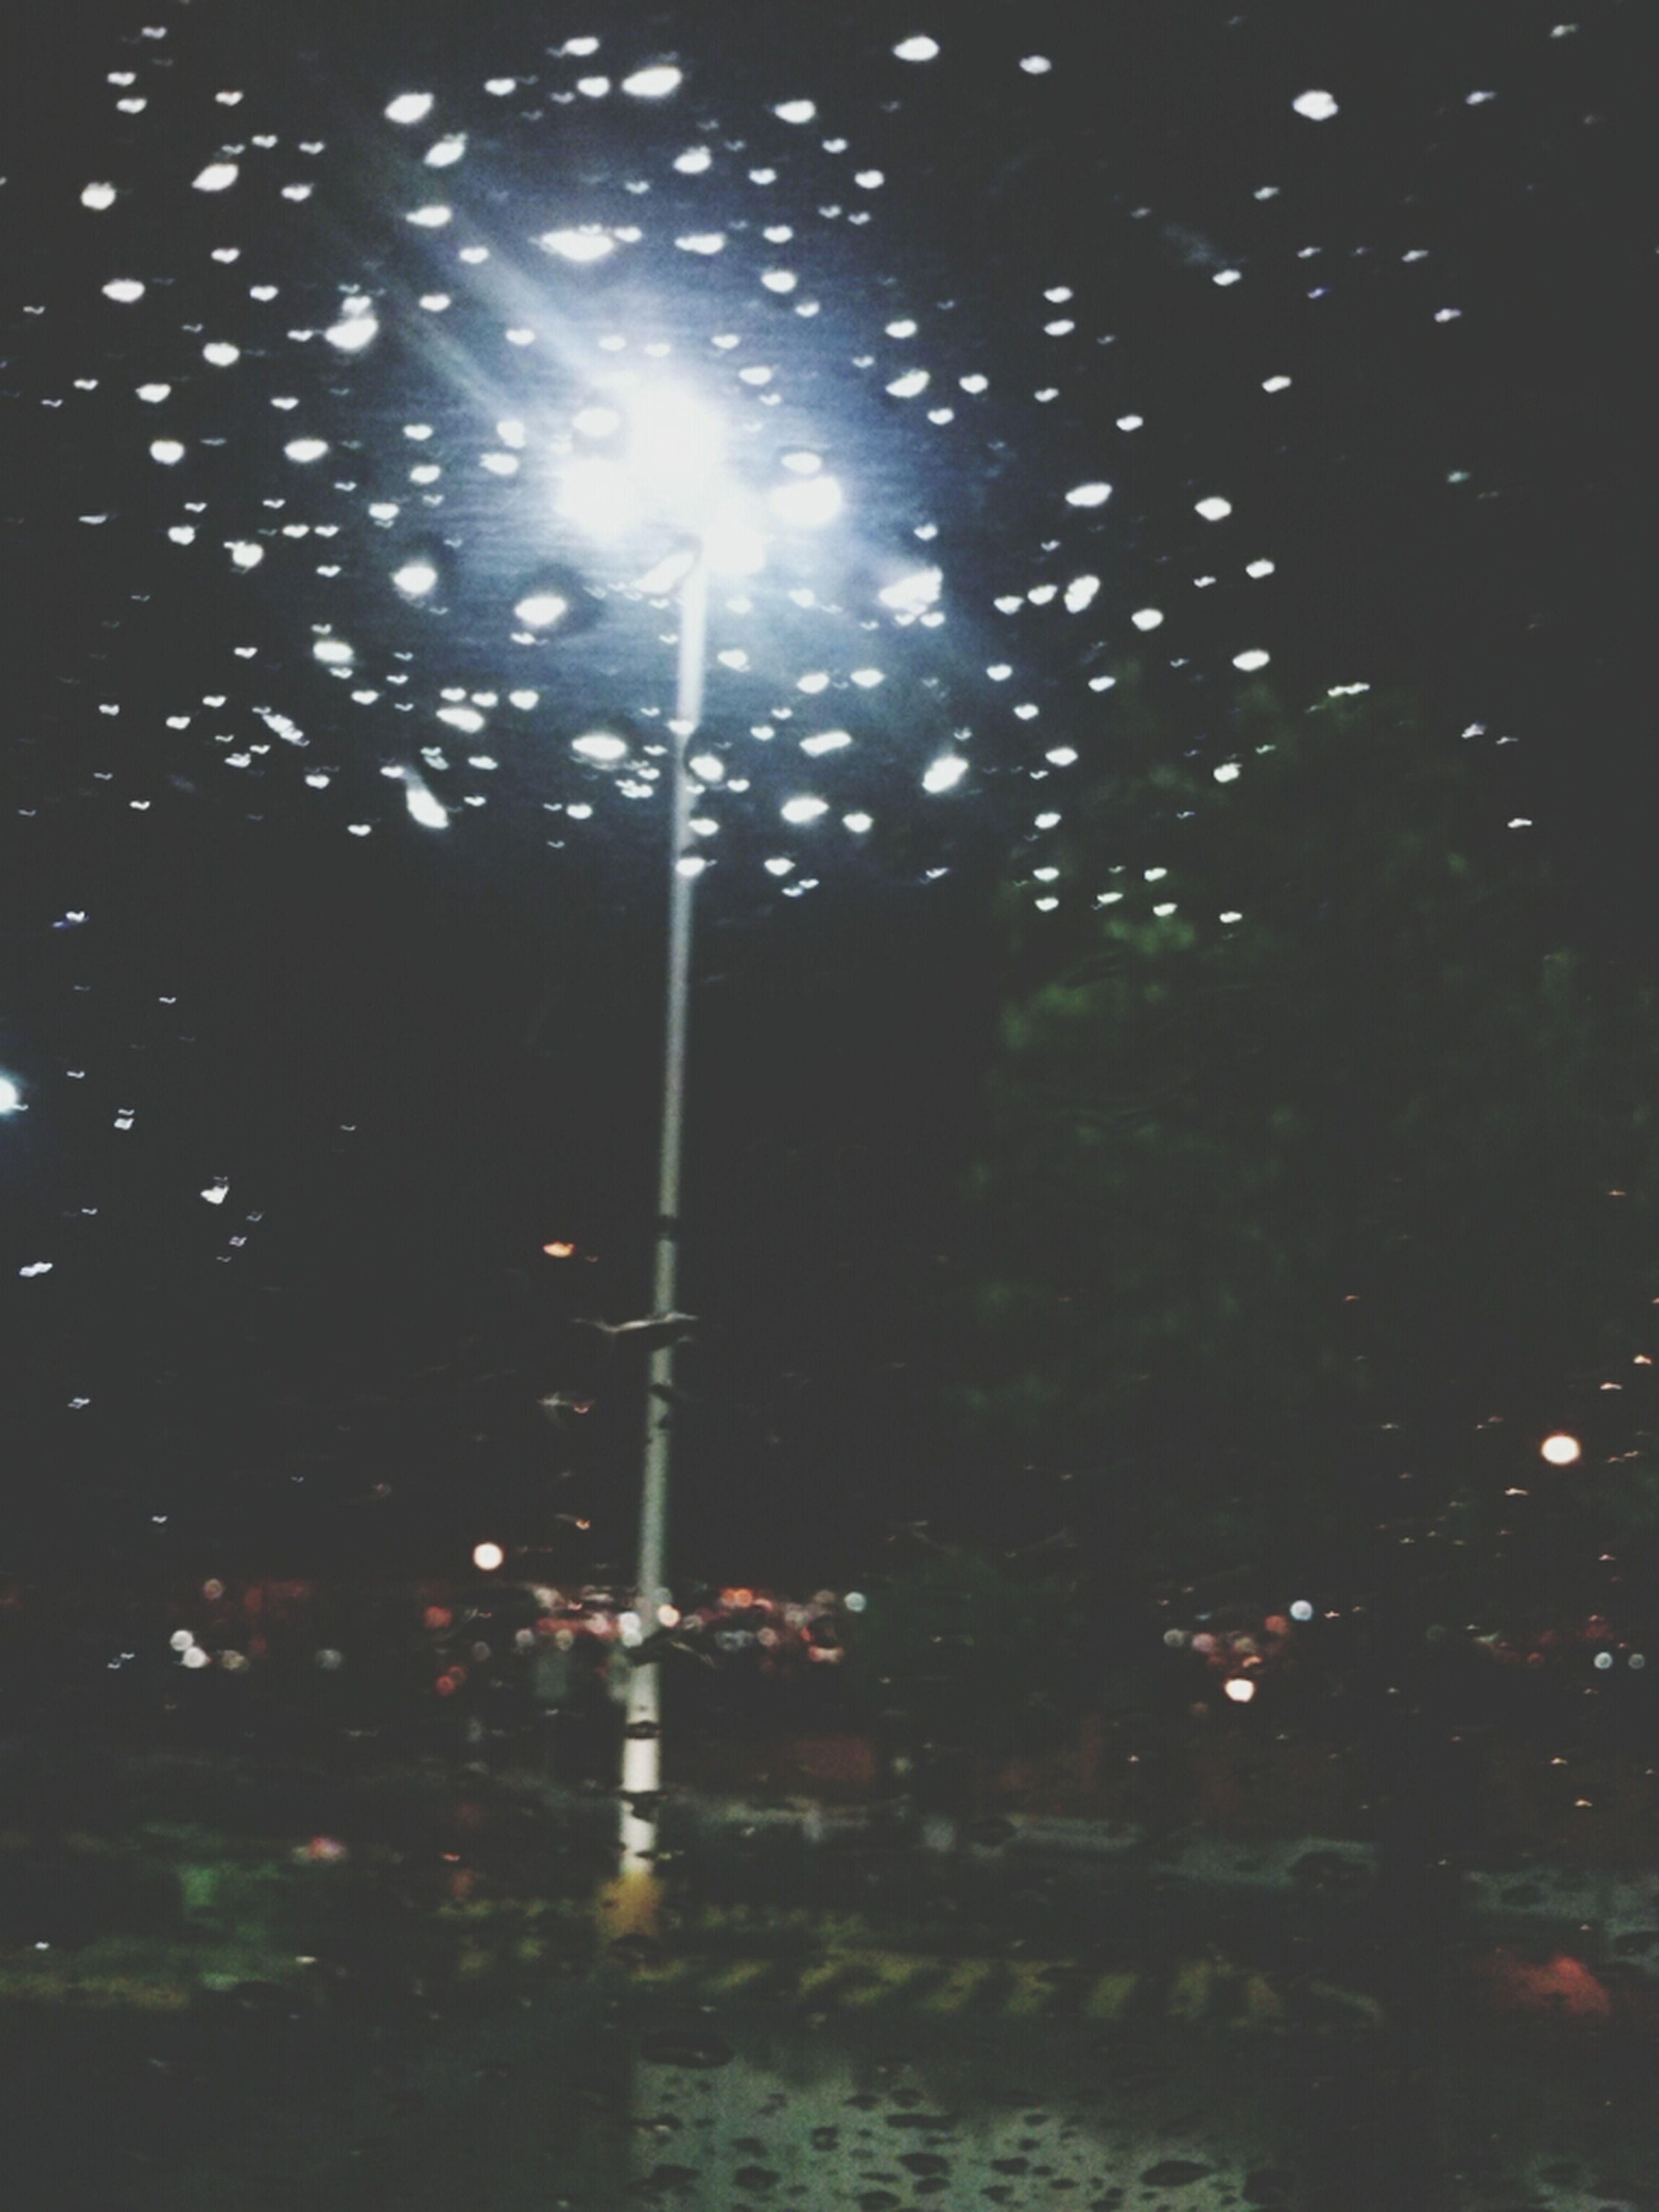 Nature Rain Love La Lluvia Siempre Tan Melancólica..